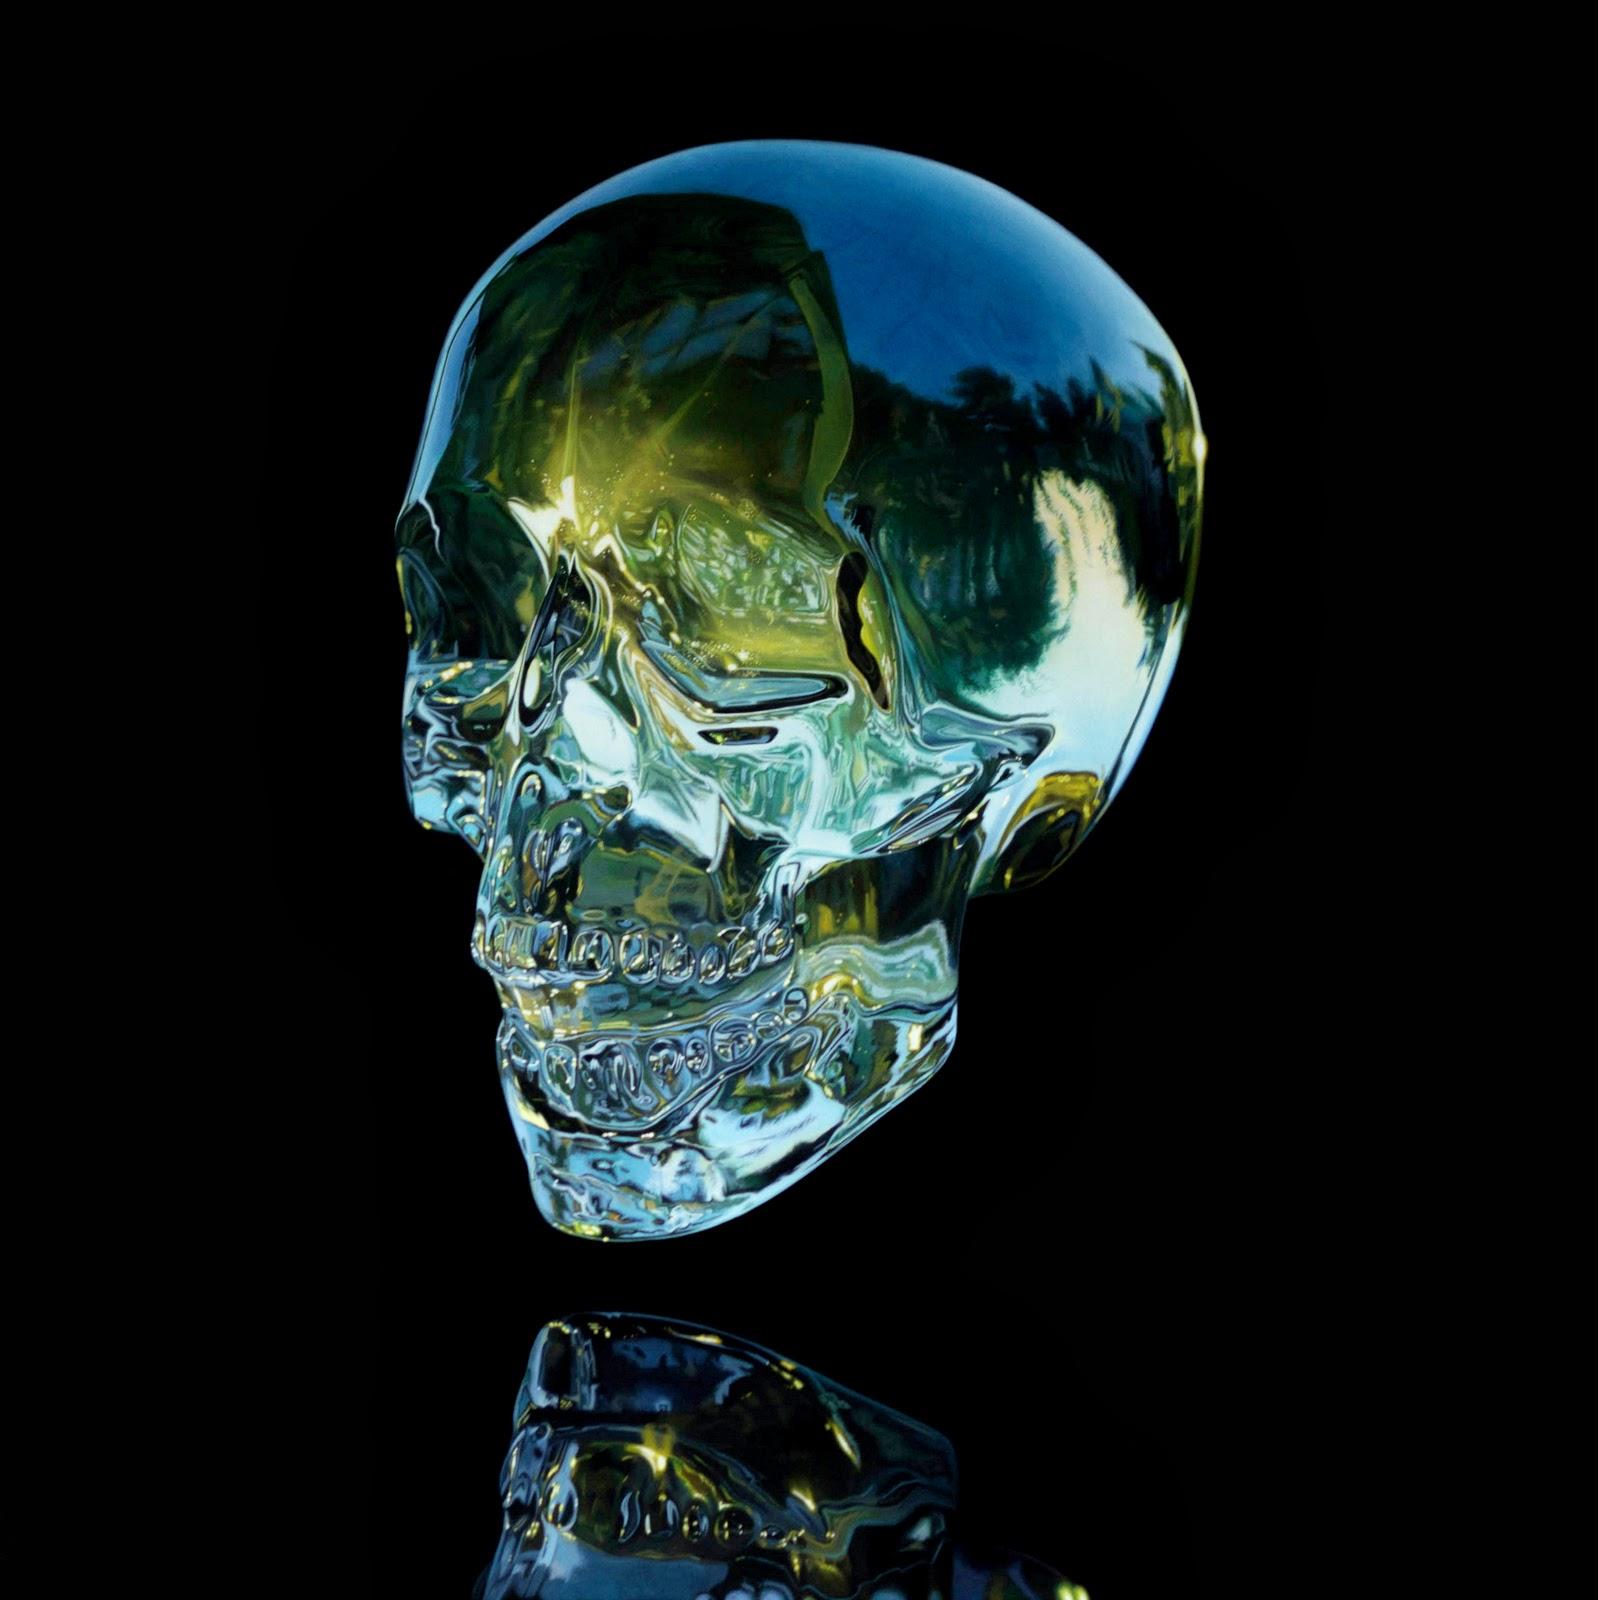 External Glass Painting